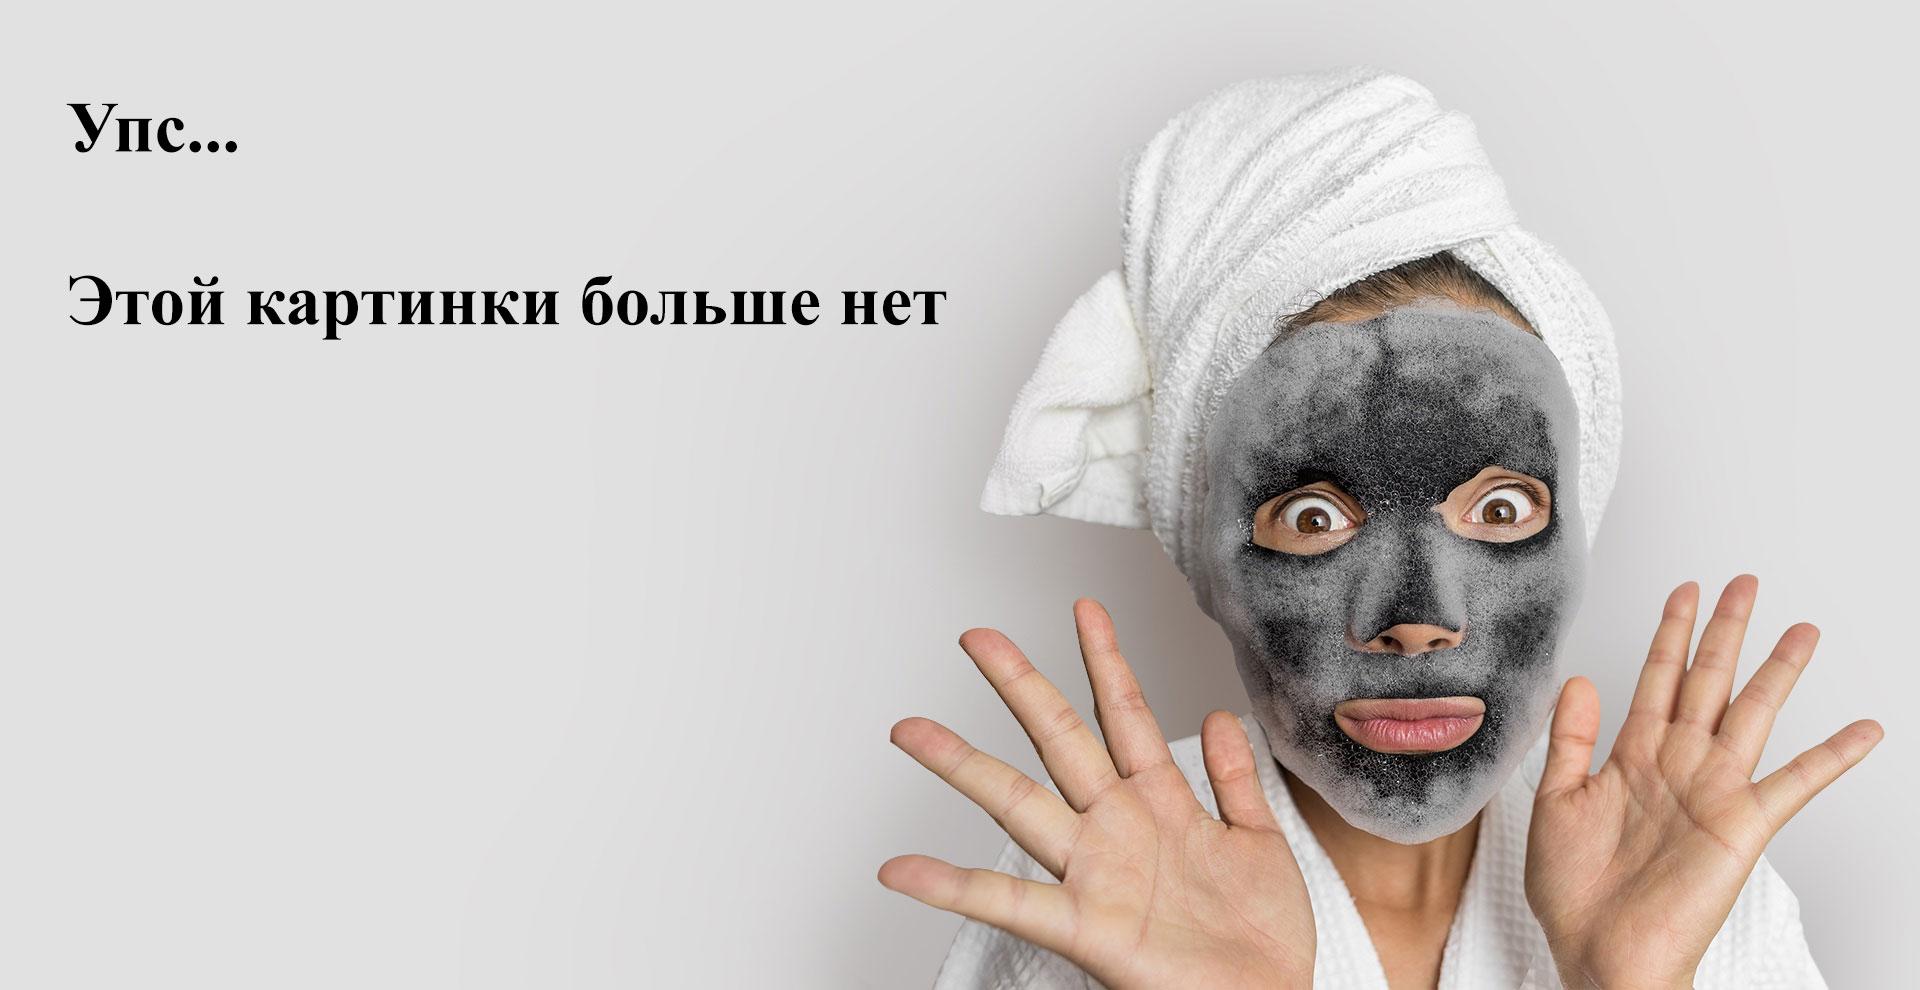 Vivienne Sabo, Губная помада Merci, тон 05